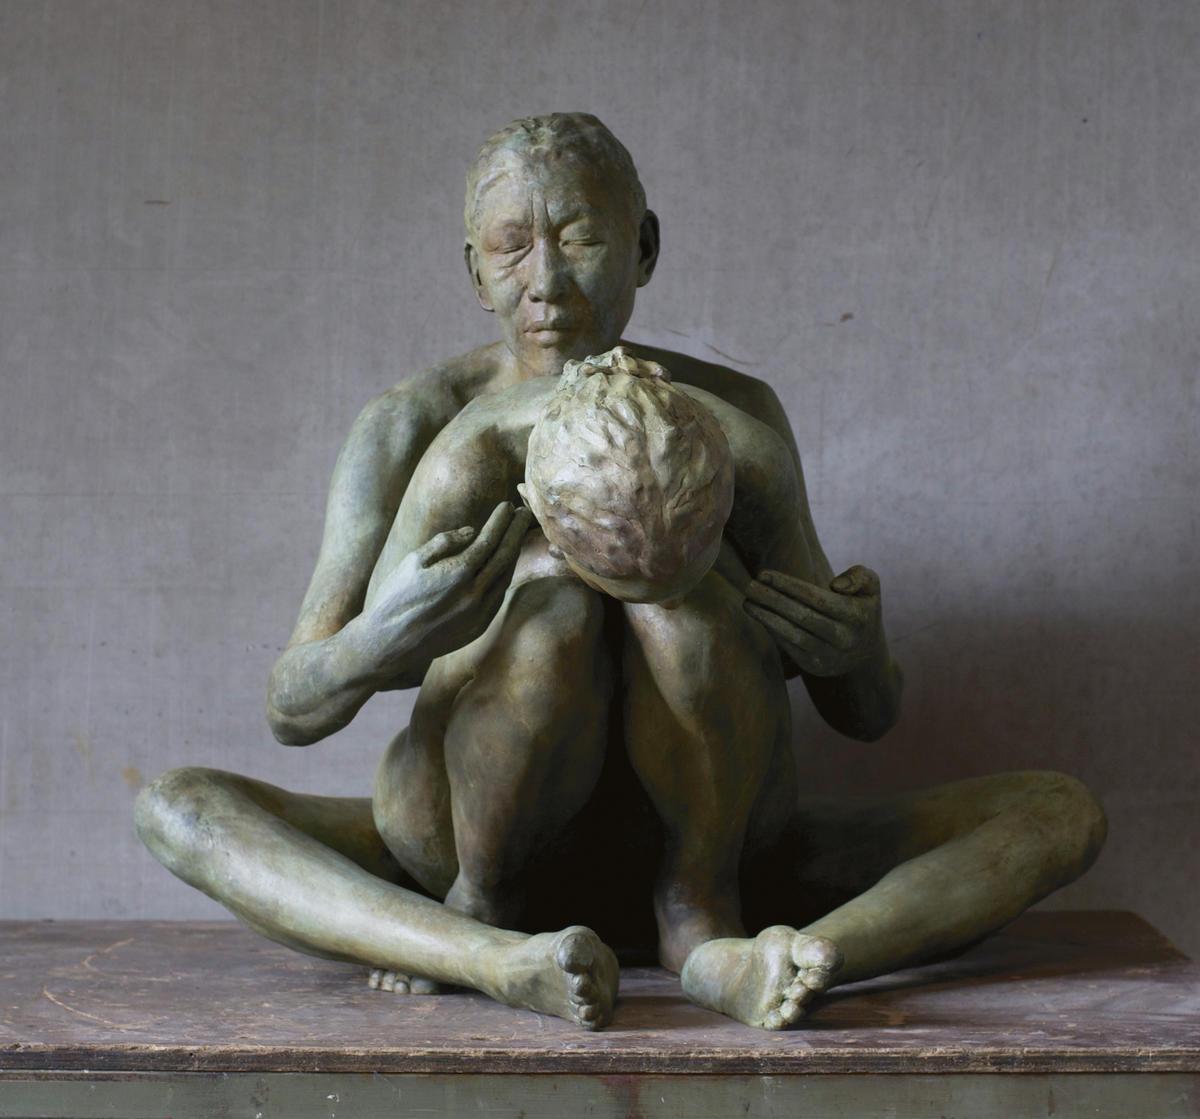 Lotta Blokker |Sculpture